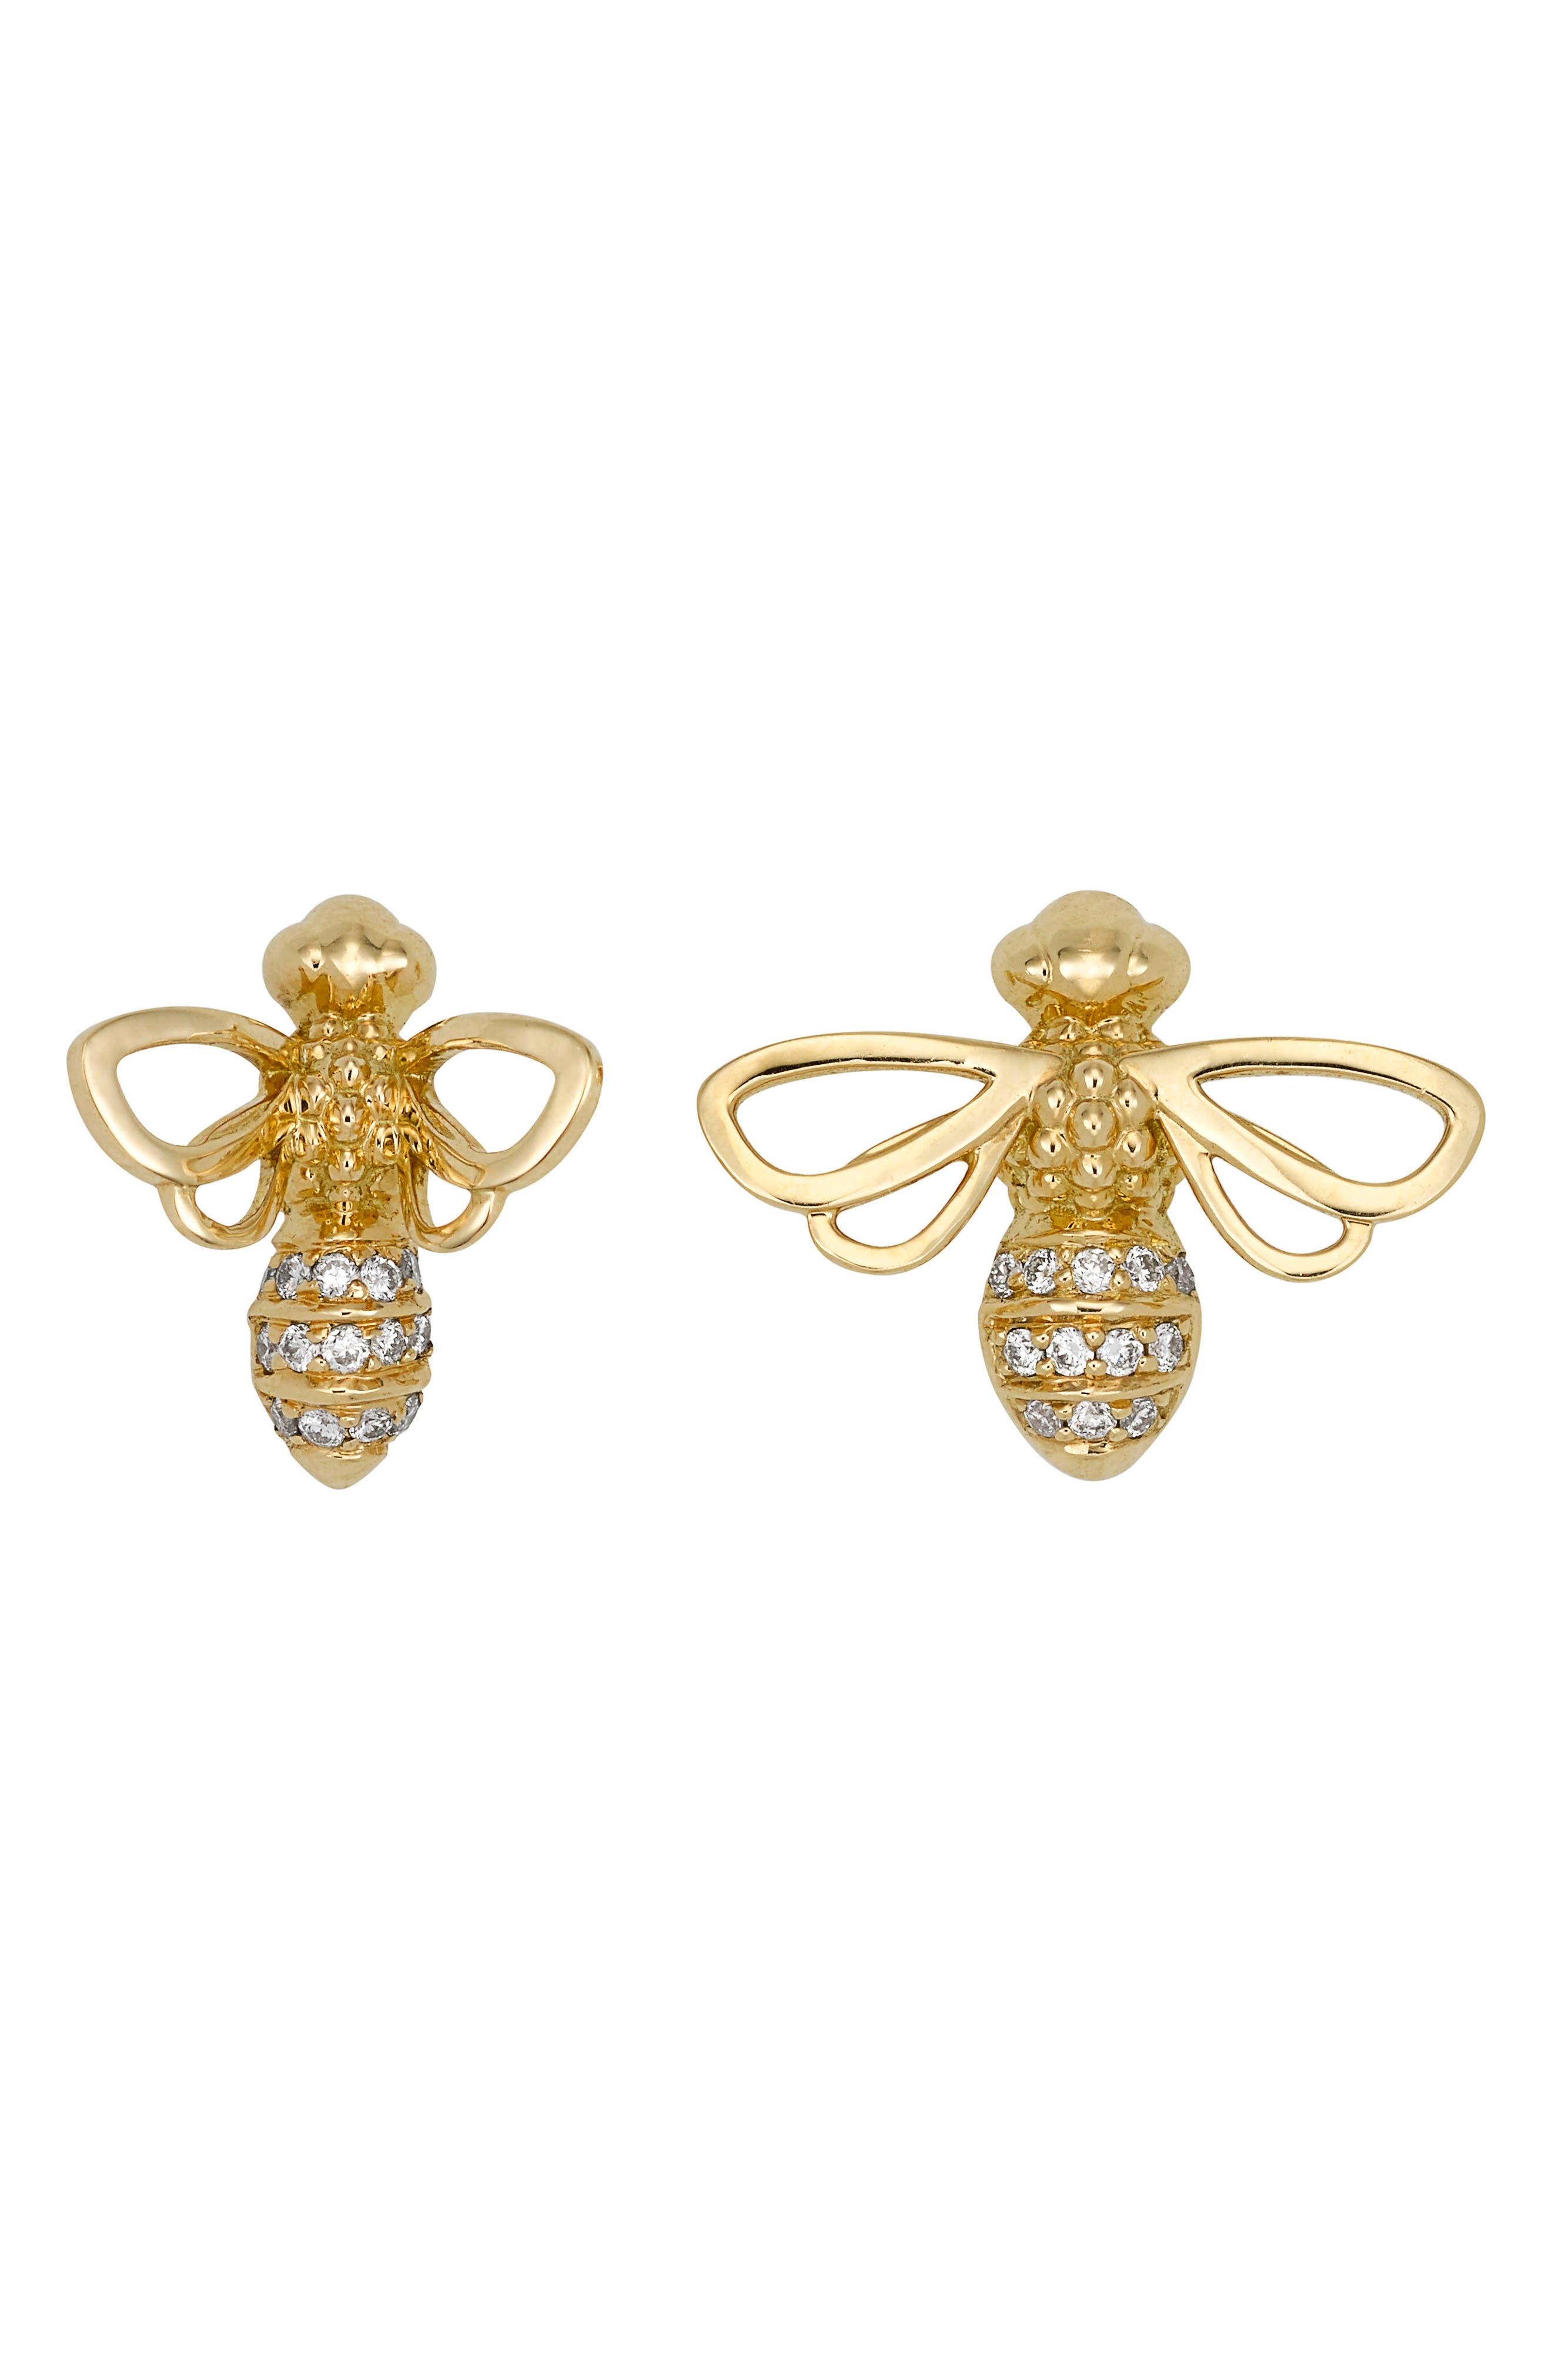 TEMPLE ST CLAIR 18K Gold & Diamond Bee Stud Earrings